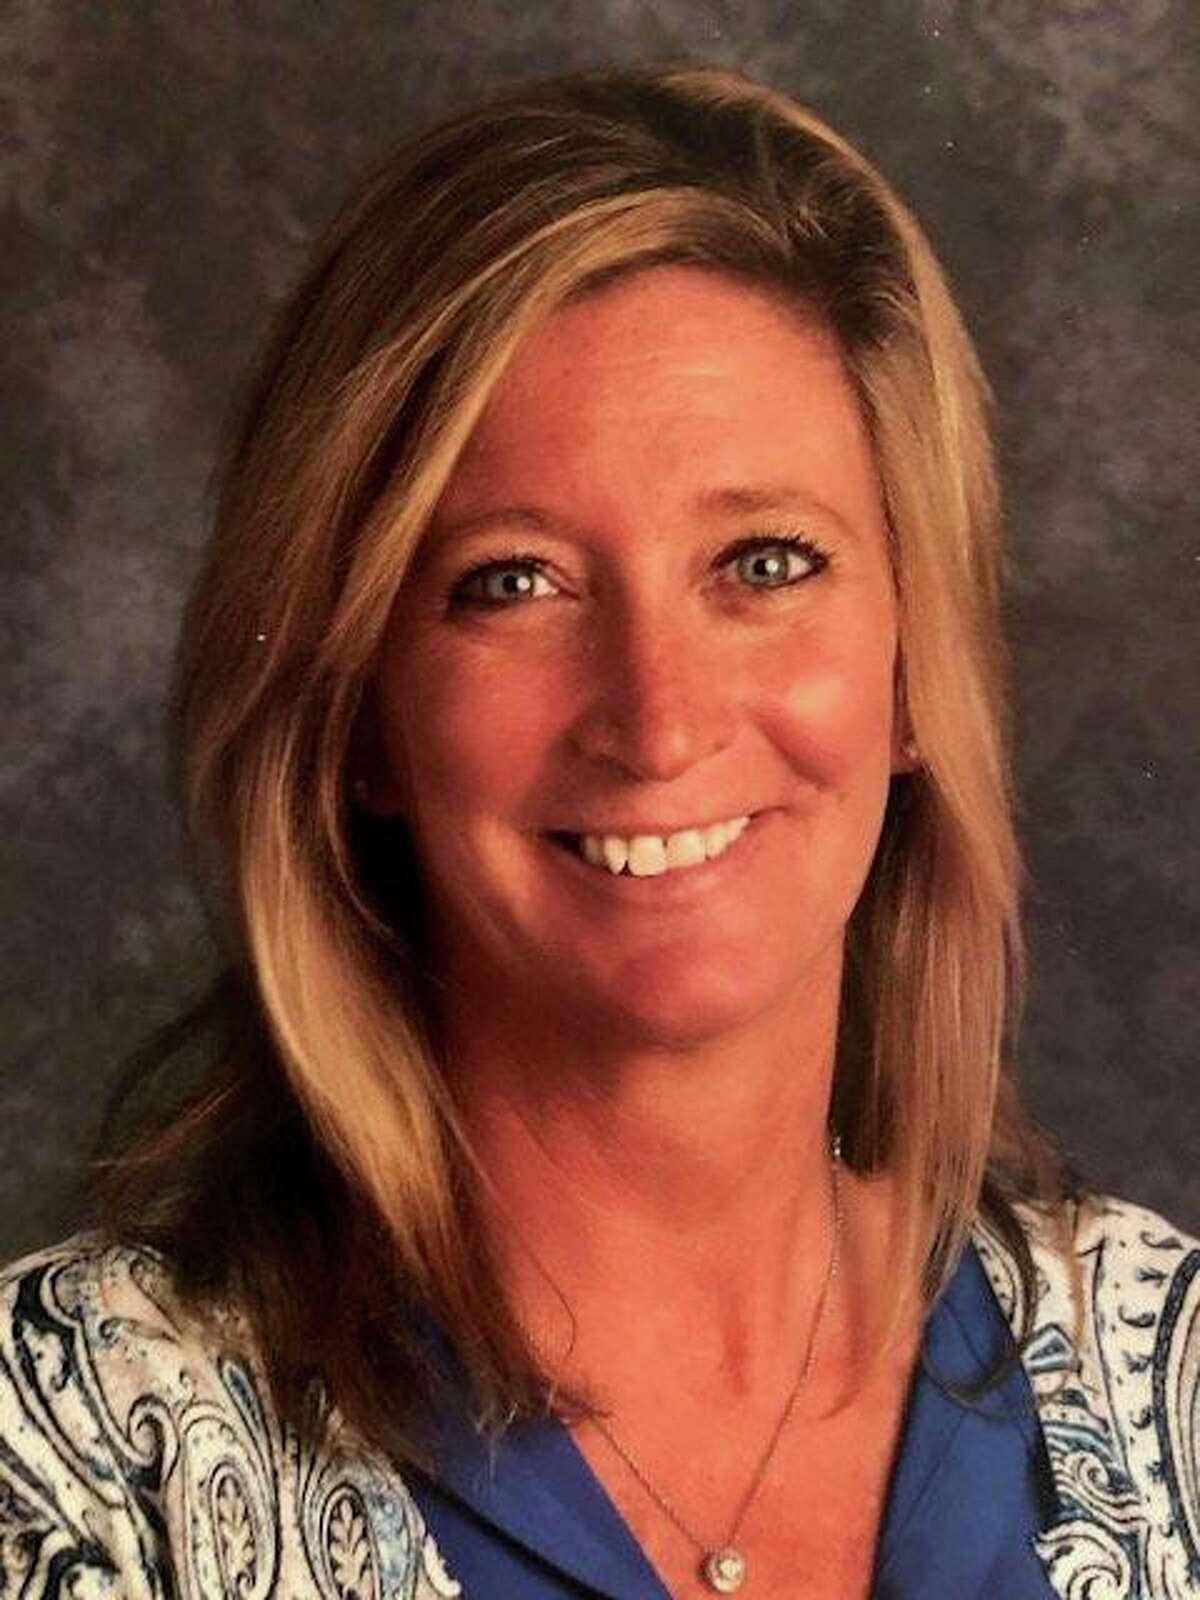 Michele Molloy, Trumbull's 2021 teacher of the year.